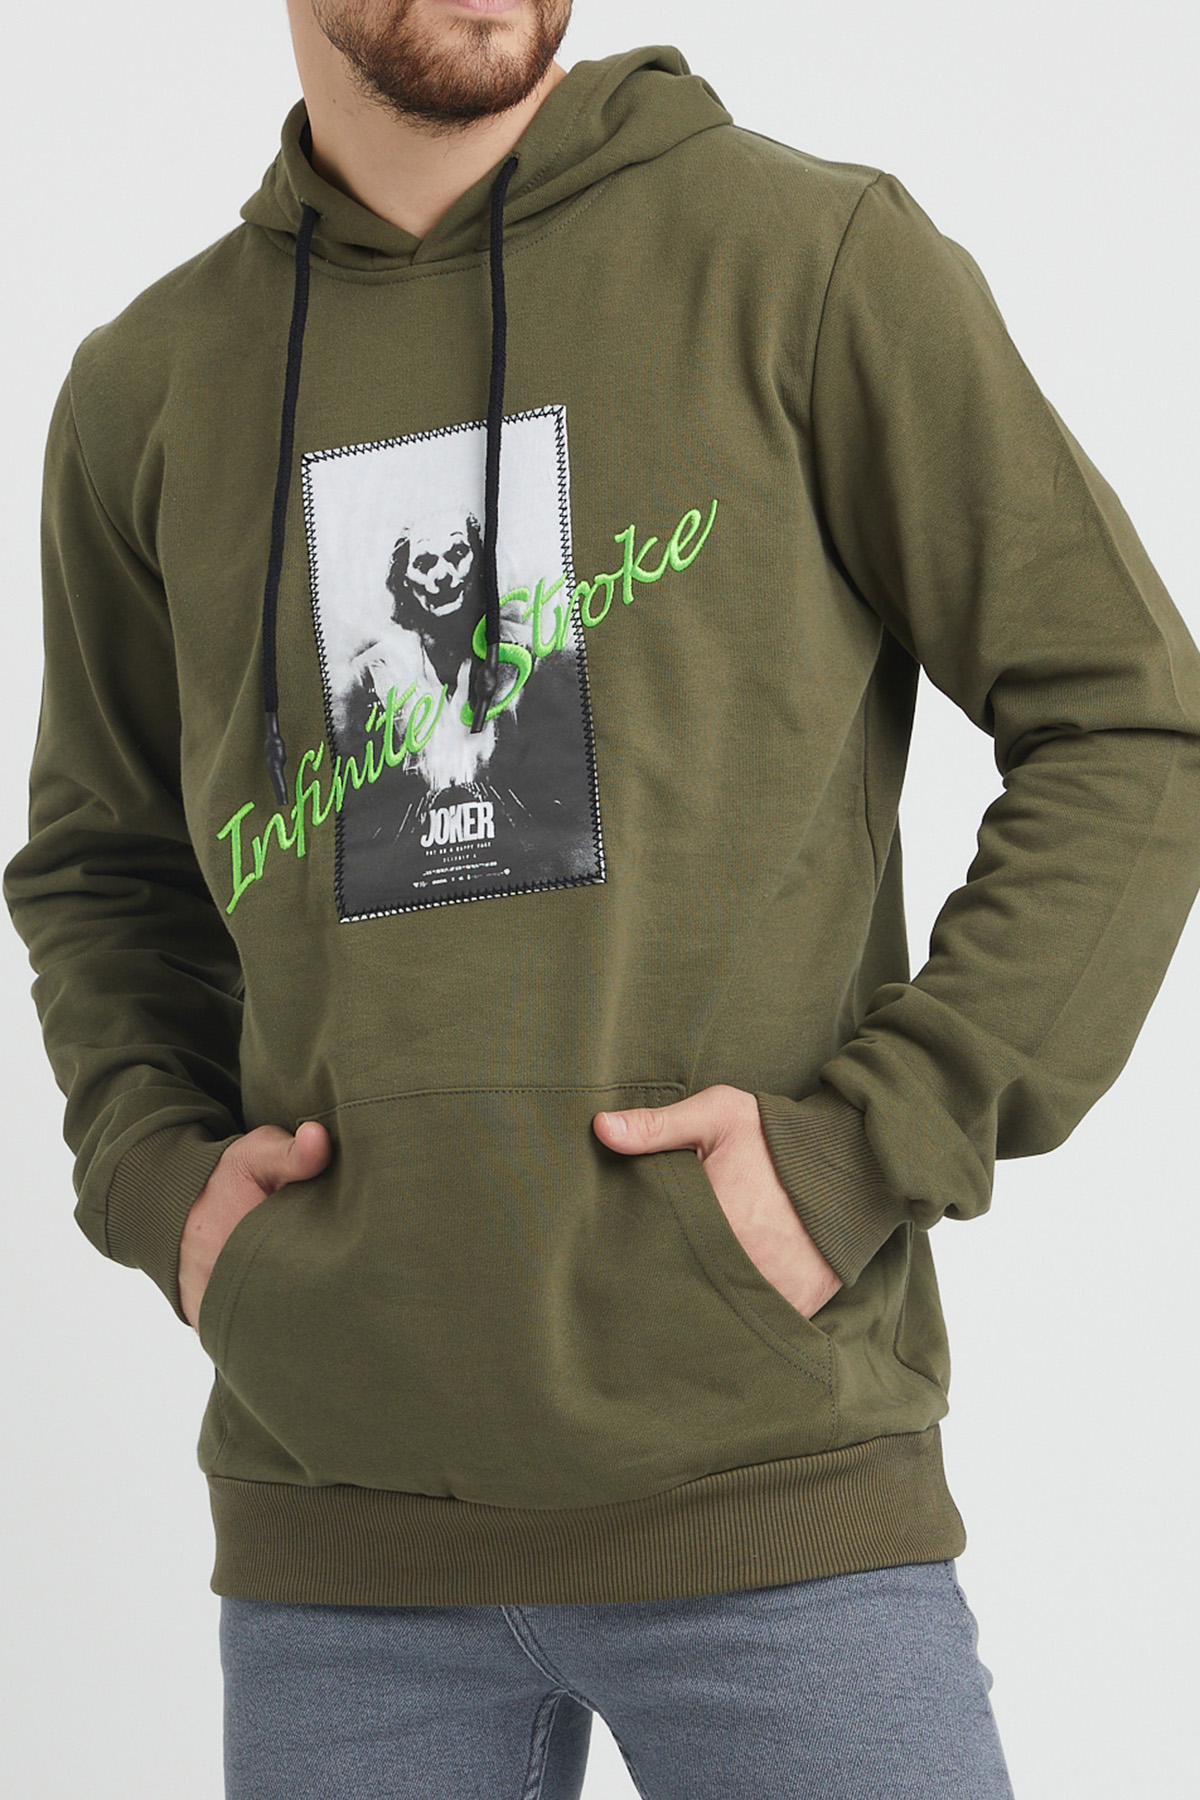 XHAN - Haki Nakış Detaylı Sweatshirt 1KXE8-44366-09